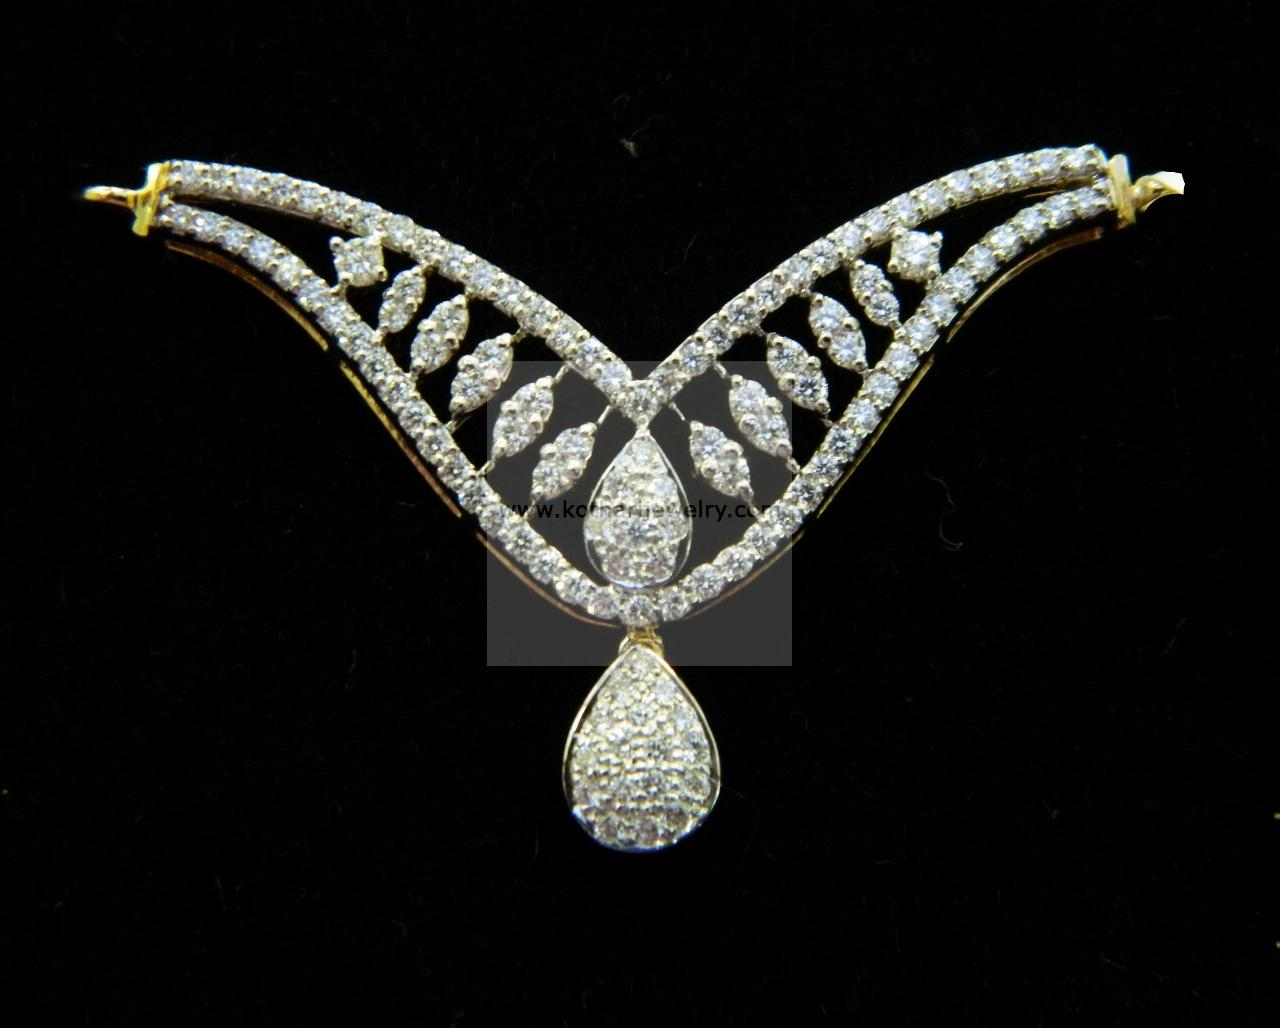 18kt Indian Diamond Mangalsutra